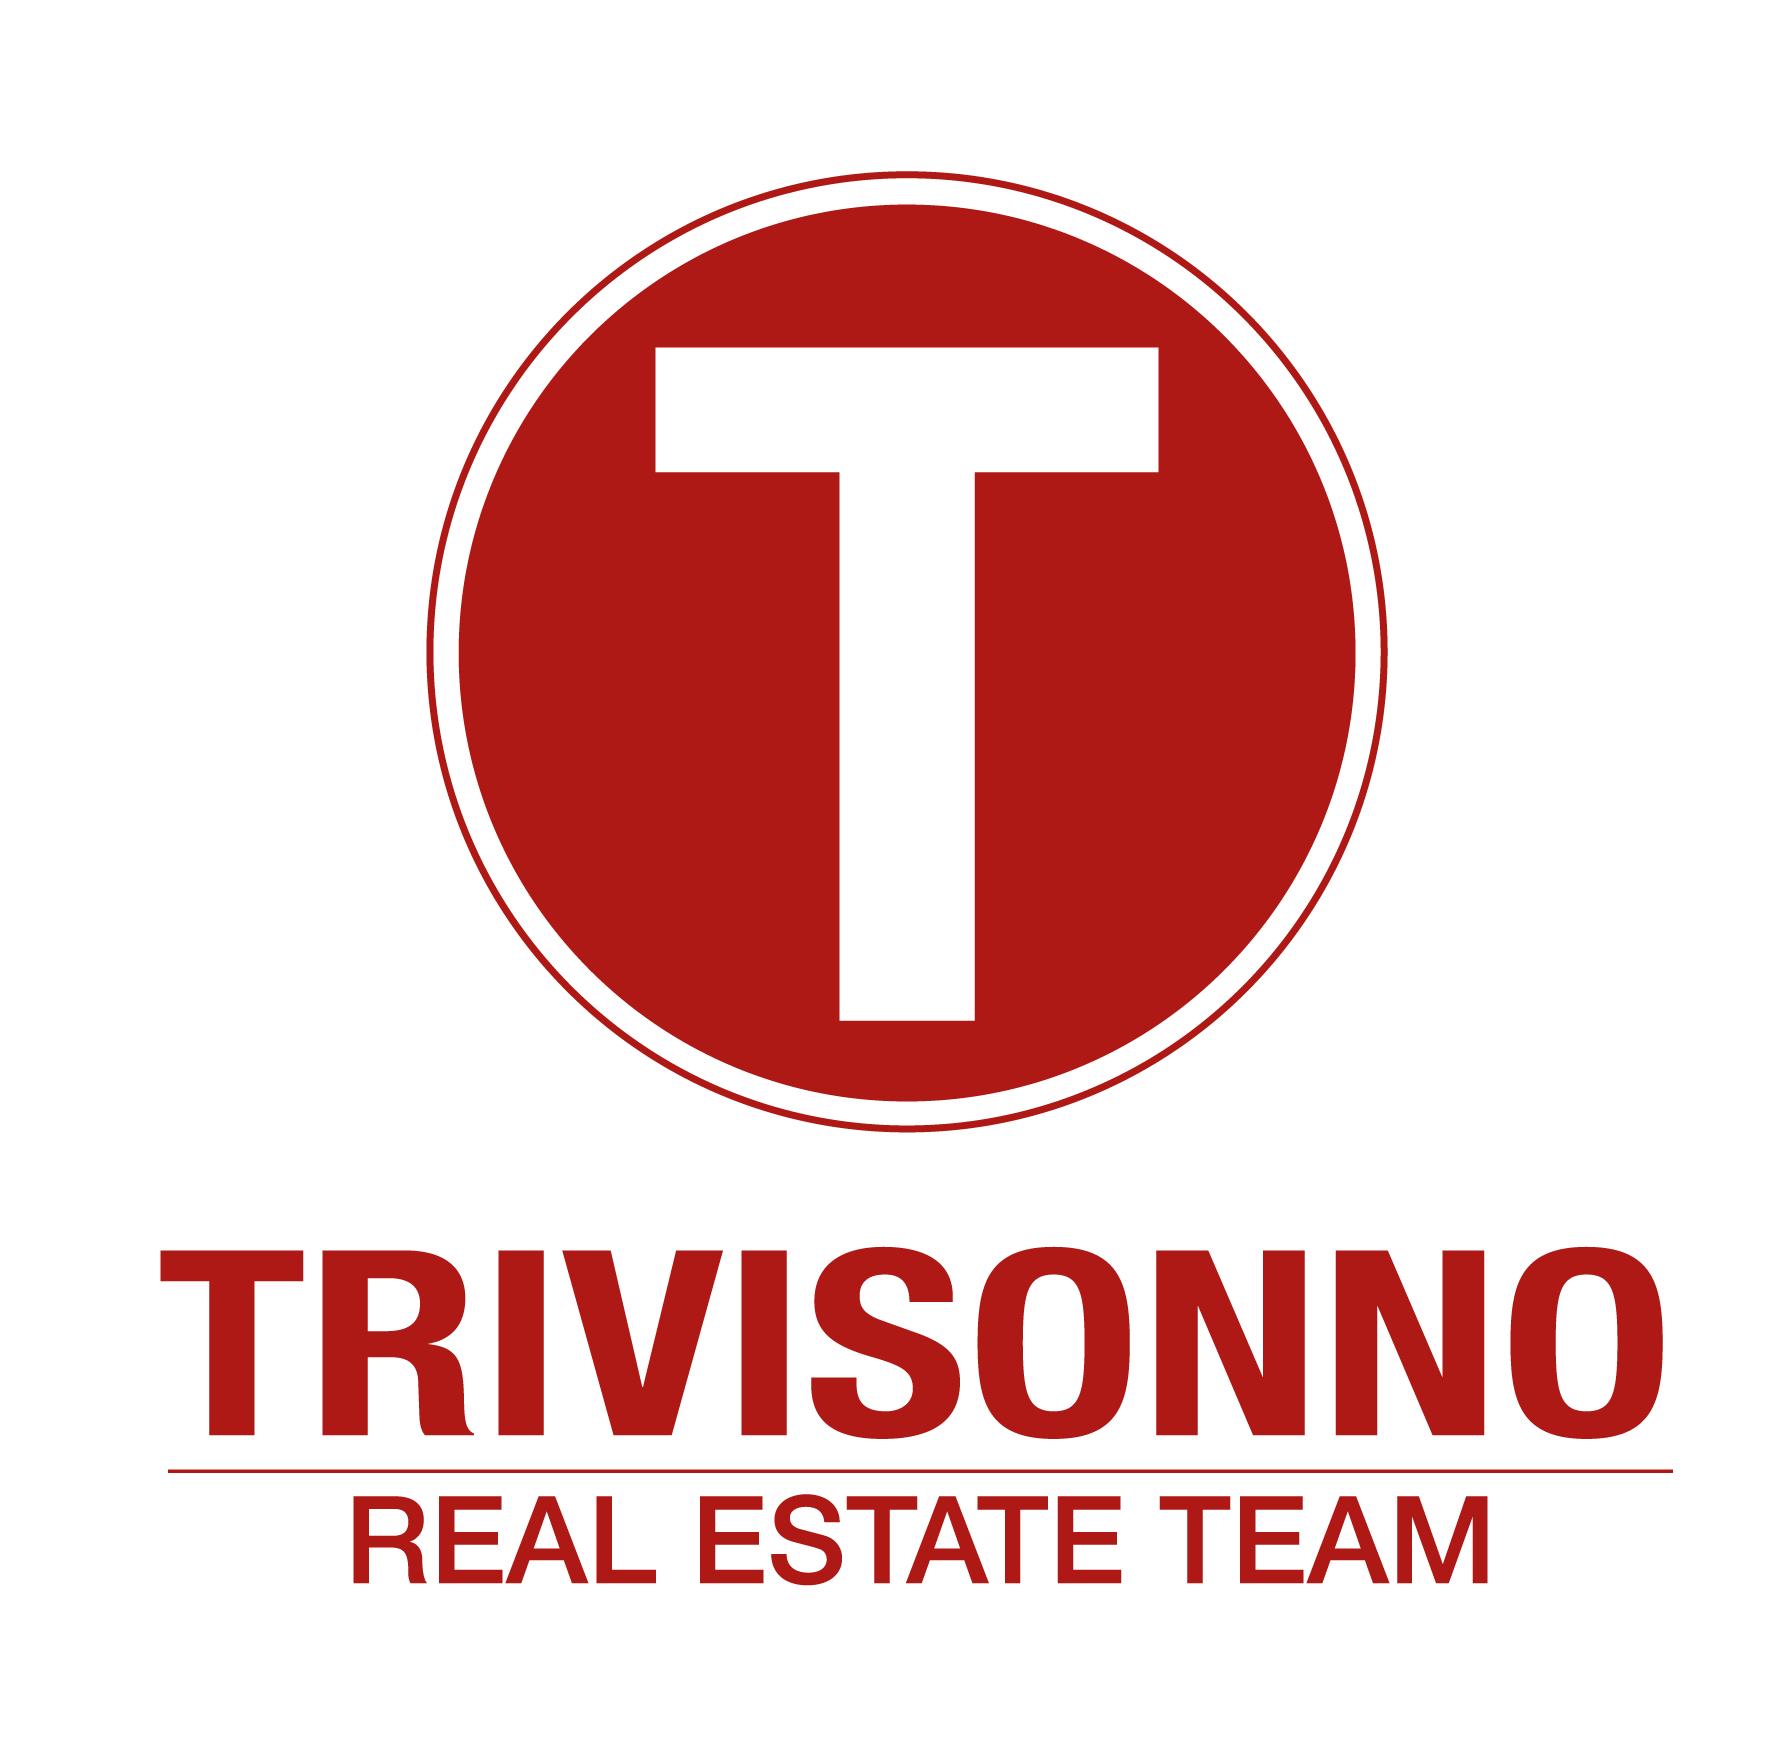 Trivisonno Real Estate - Keller Williams logo